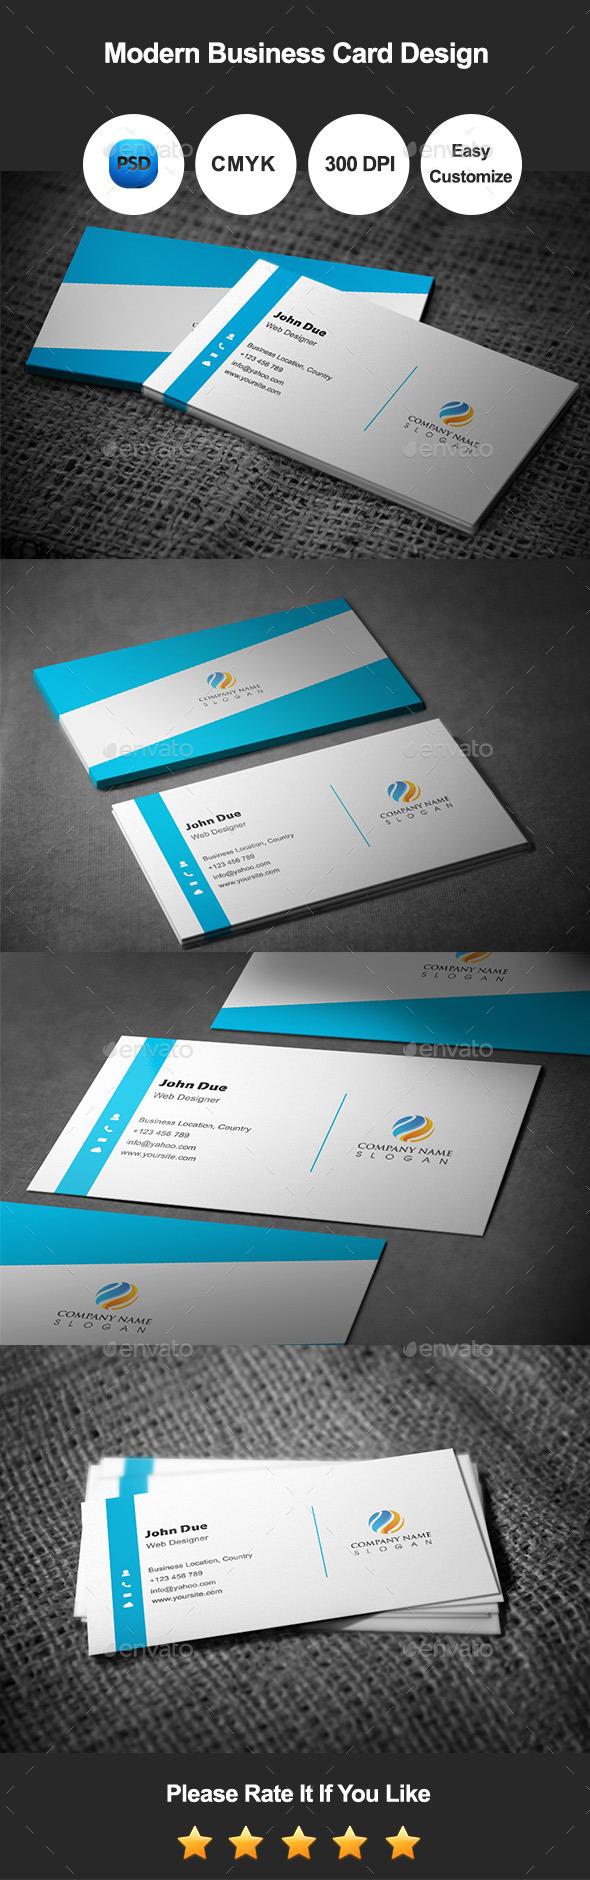 Modern Business Card Template Design - Corporate Business Cards